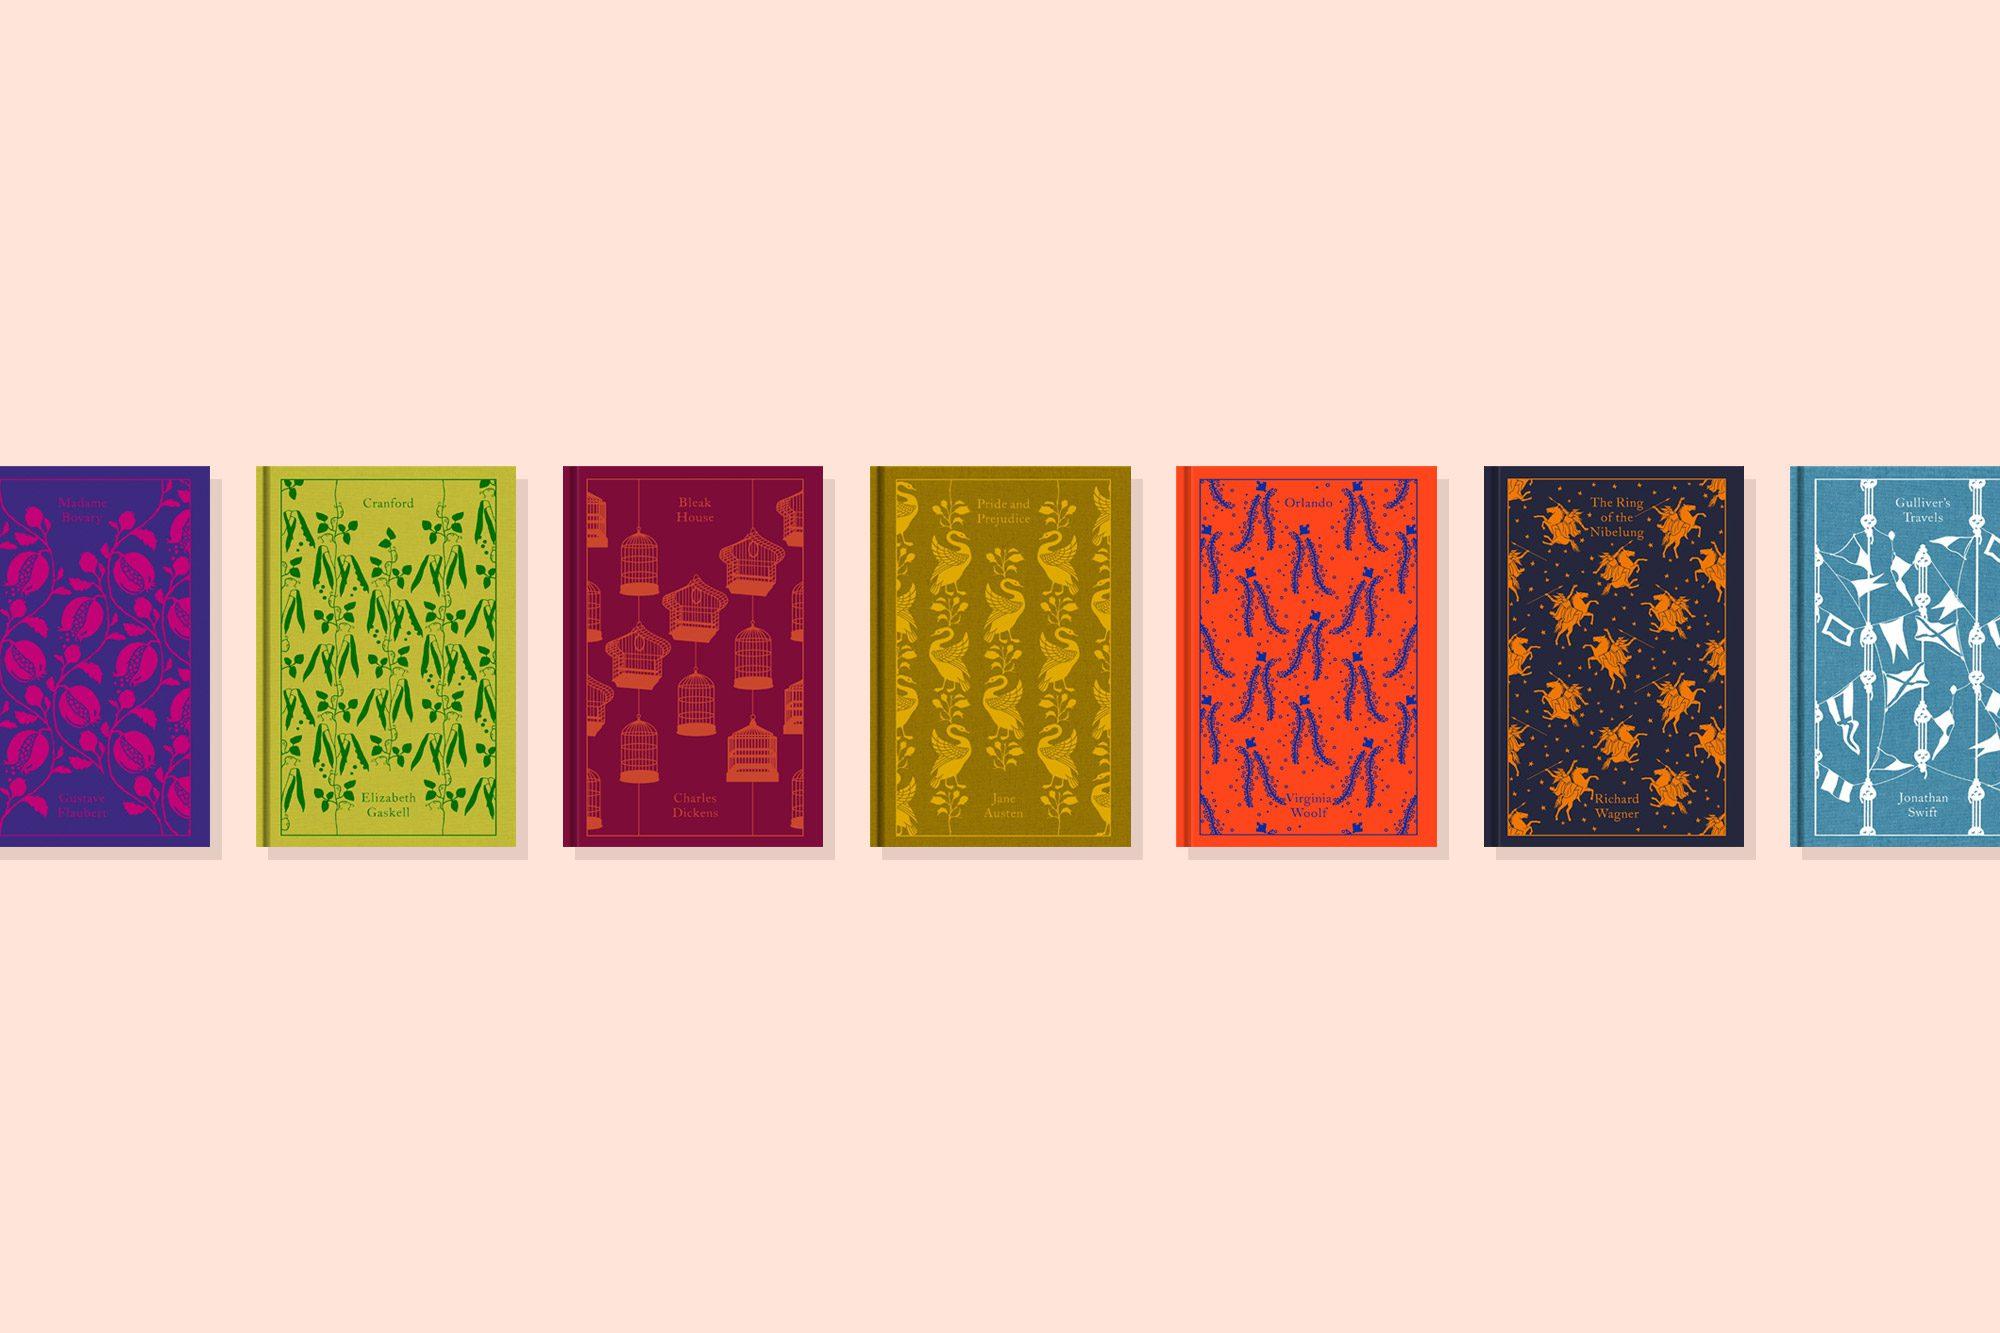 4d8665570e2 Penguin Clothbound Classics  The Complete List - Tale Away